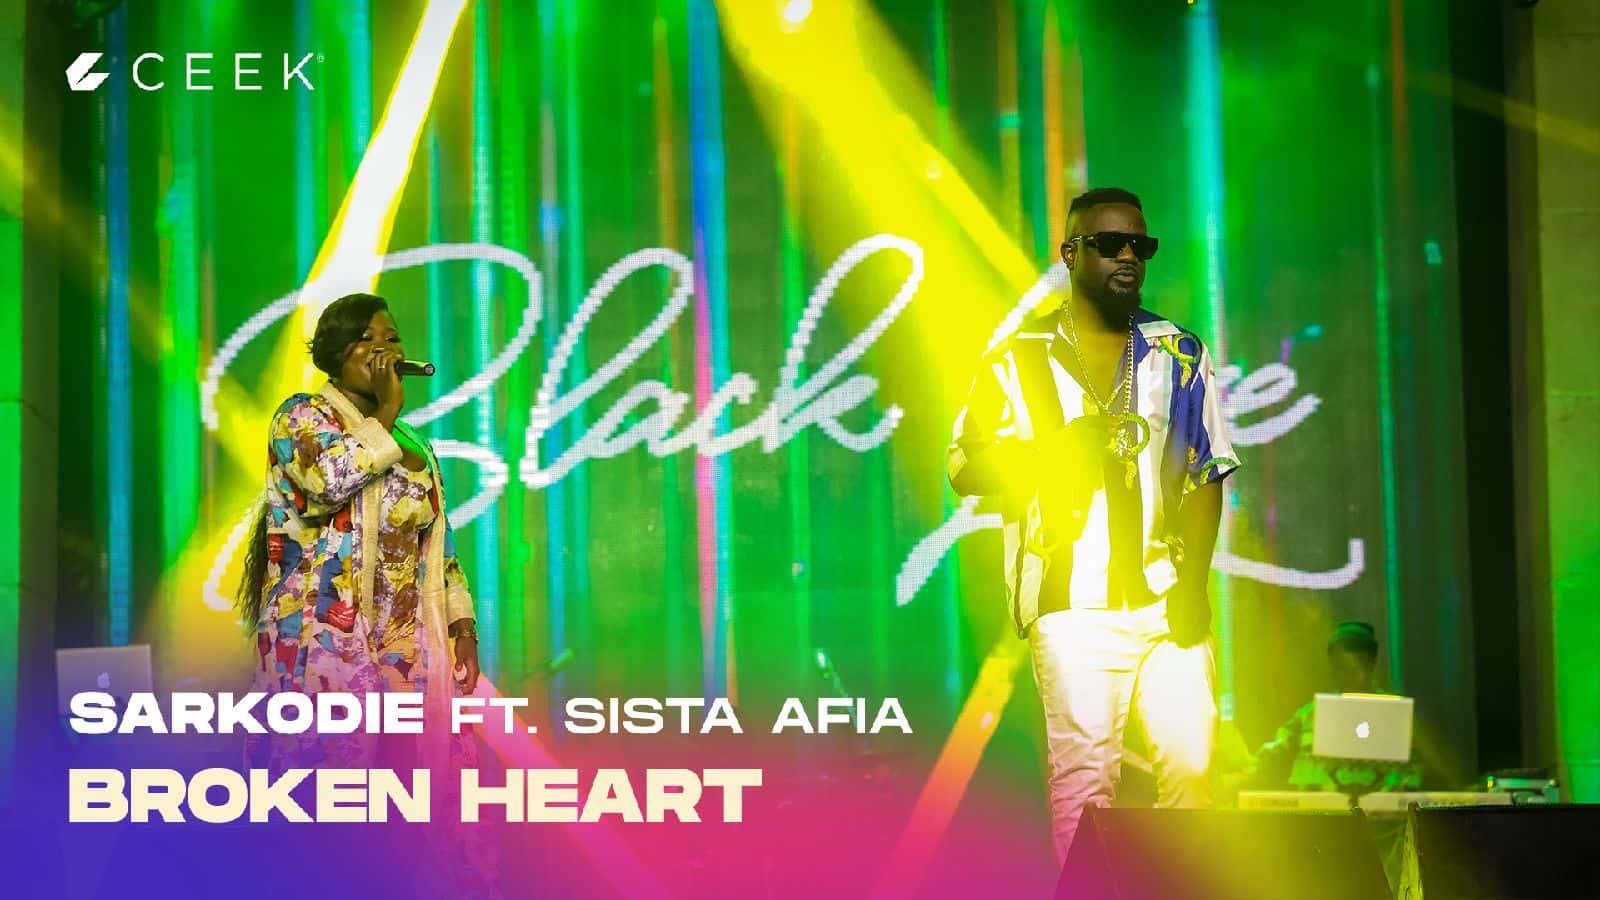 Broken Heart ft. Sista Afia